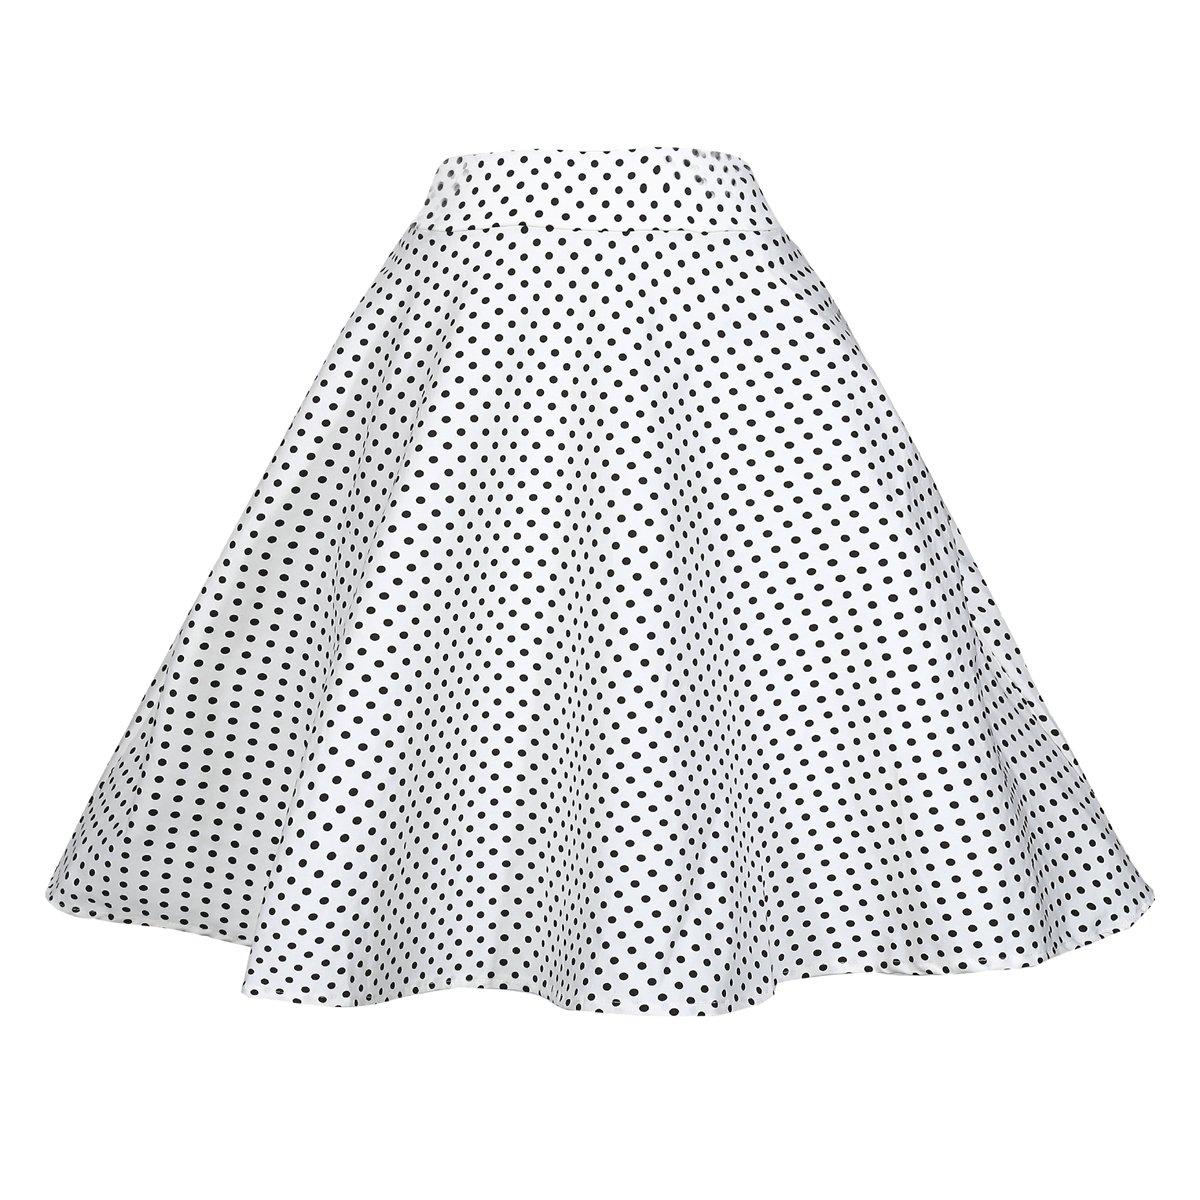 BI.TENCON Women 1950s Vintage Style White with Black Polka Dot Printed Swing Cotton Skirt with Pockets Plus XL